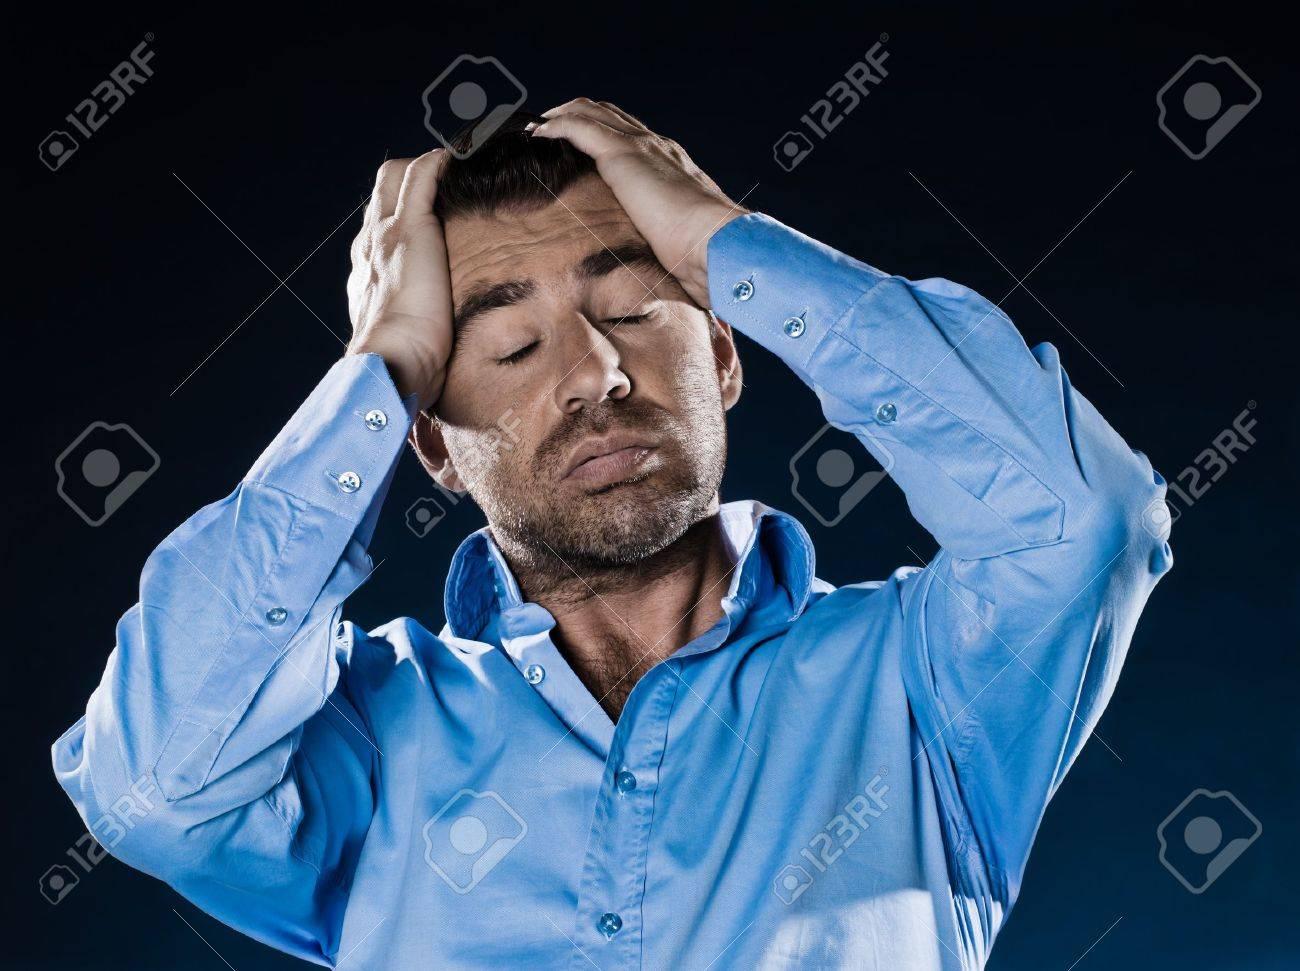 caucasian man fed up unshaven portrait isolated studio on black background Stock Photo - 11752747